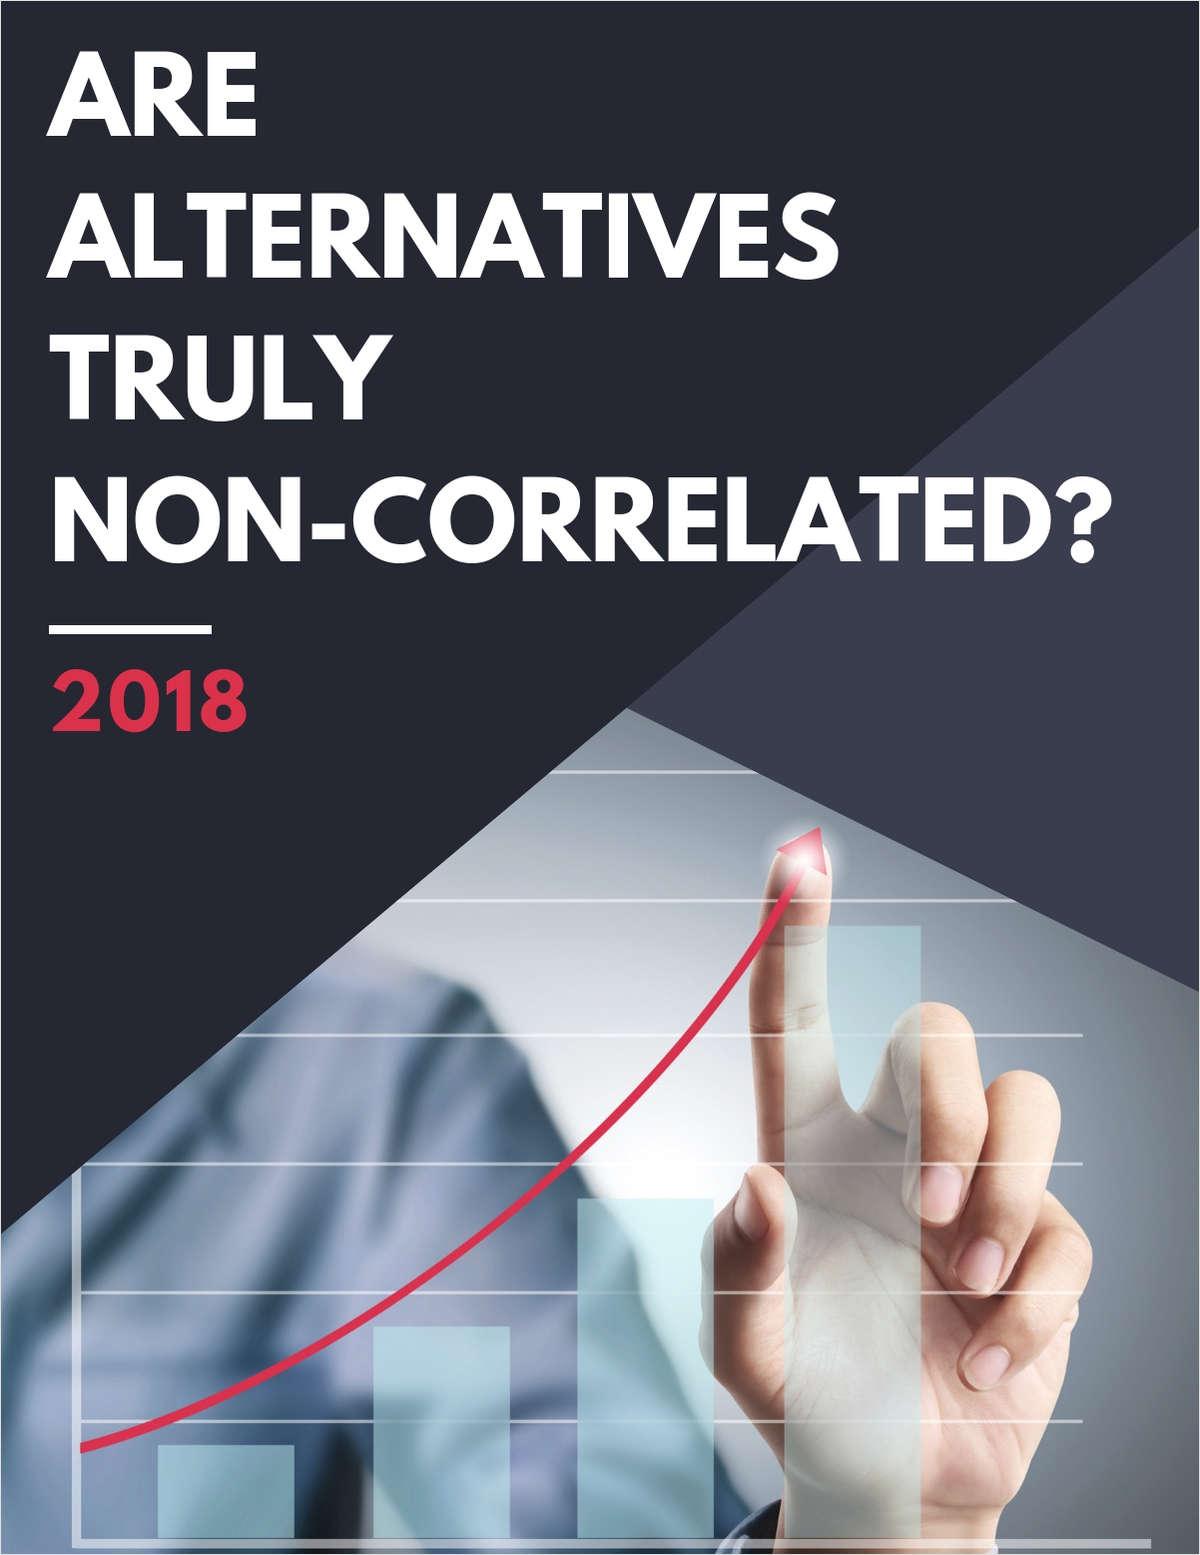 Are Alternatives Truly Non-Correlated?